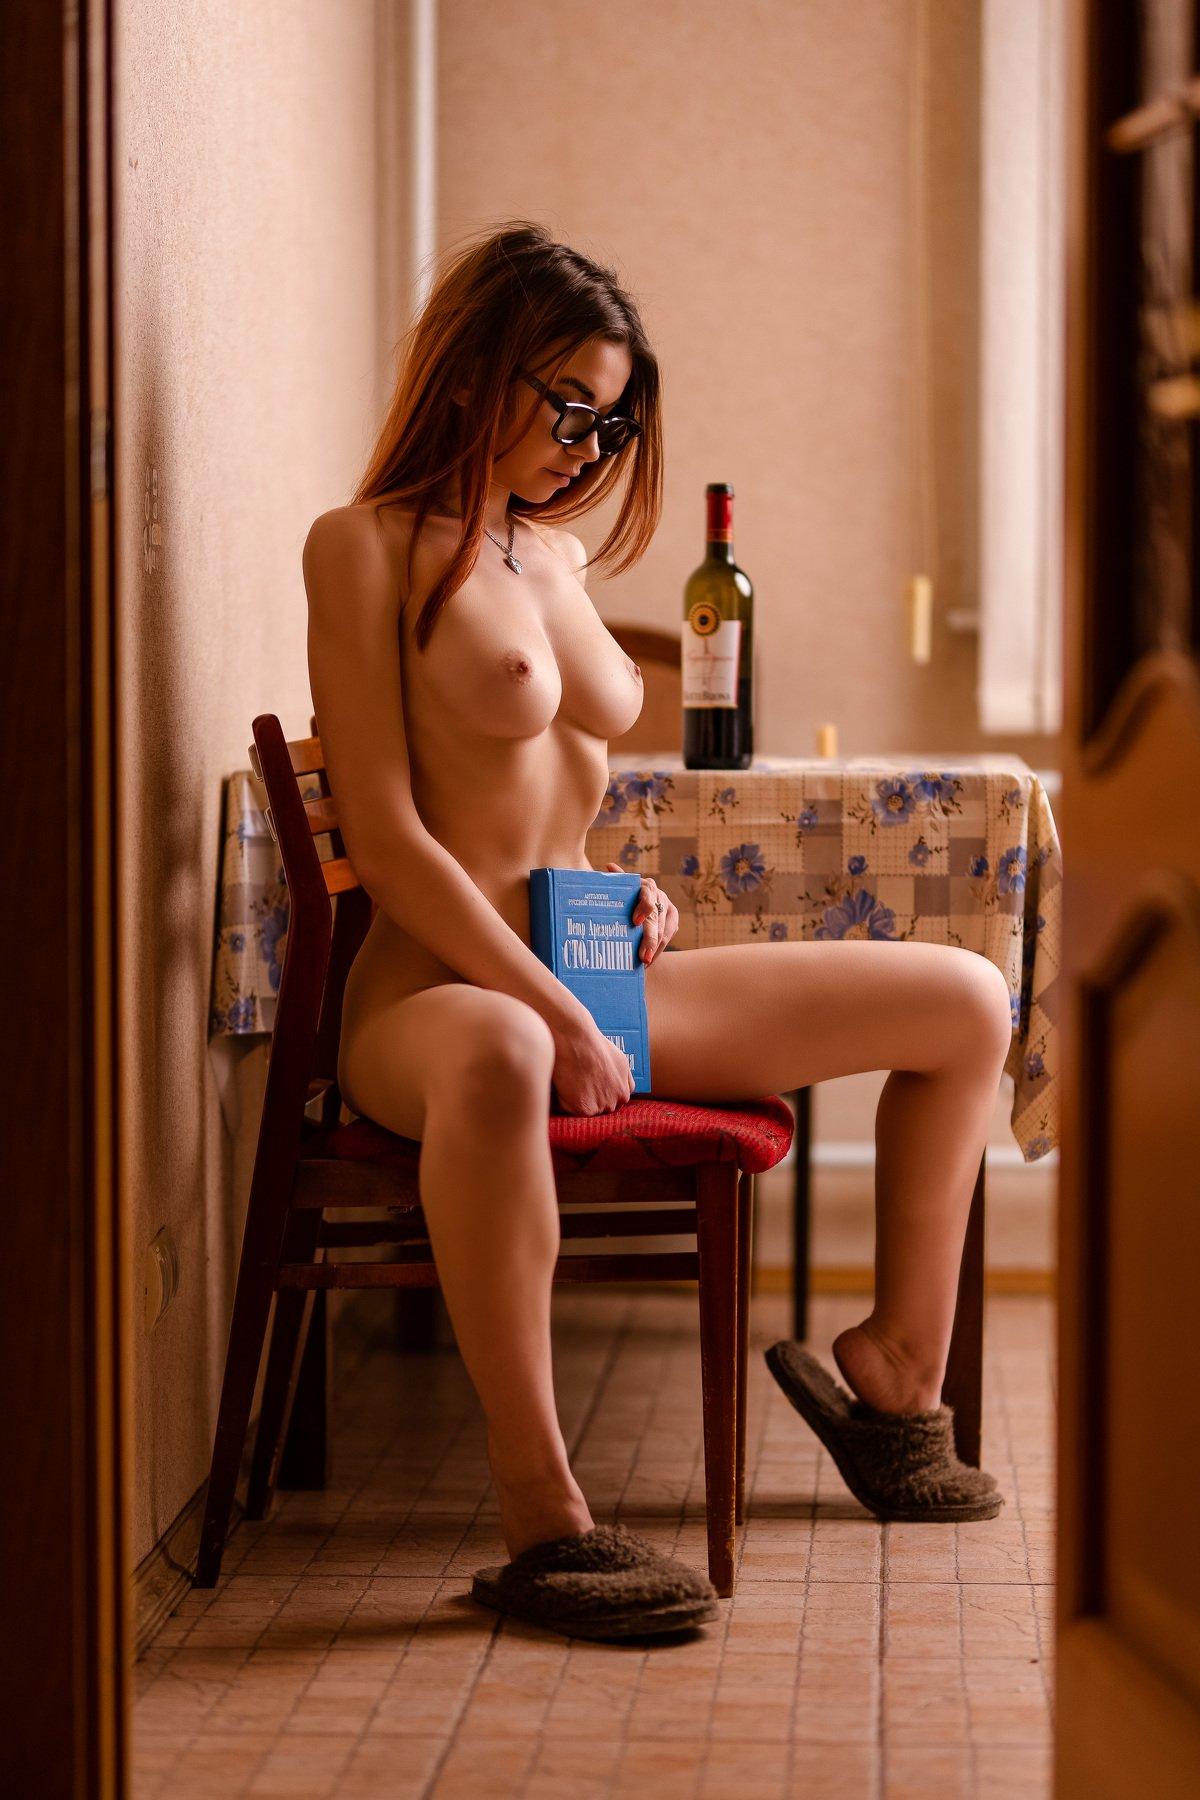 nude, girl, russian, home, topless, vine, pretty, Пистолетов Илья